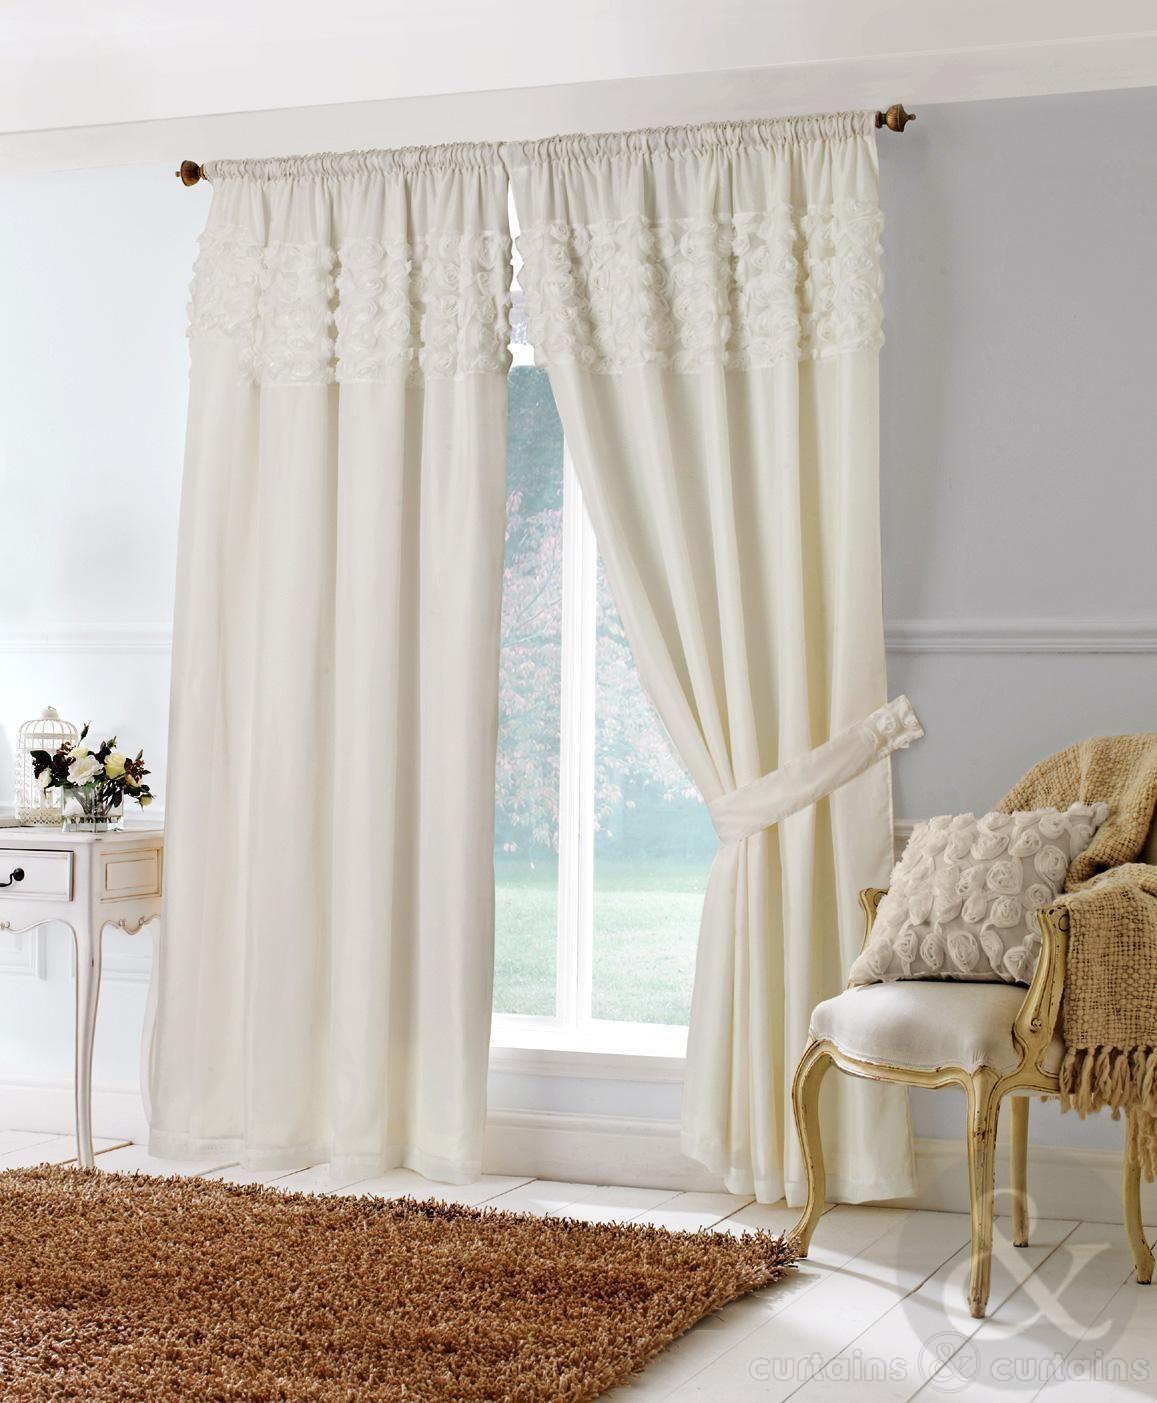 Beautiful Bedroom Curtains Designs   Curtain designs ... on Beautiful Bedroom Curtains  id=99538